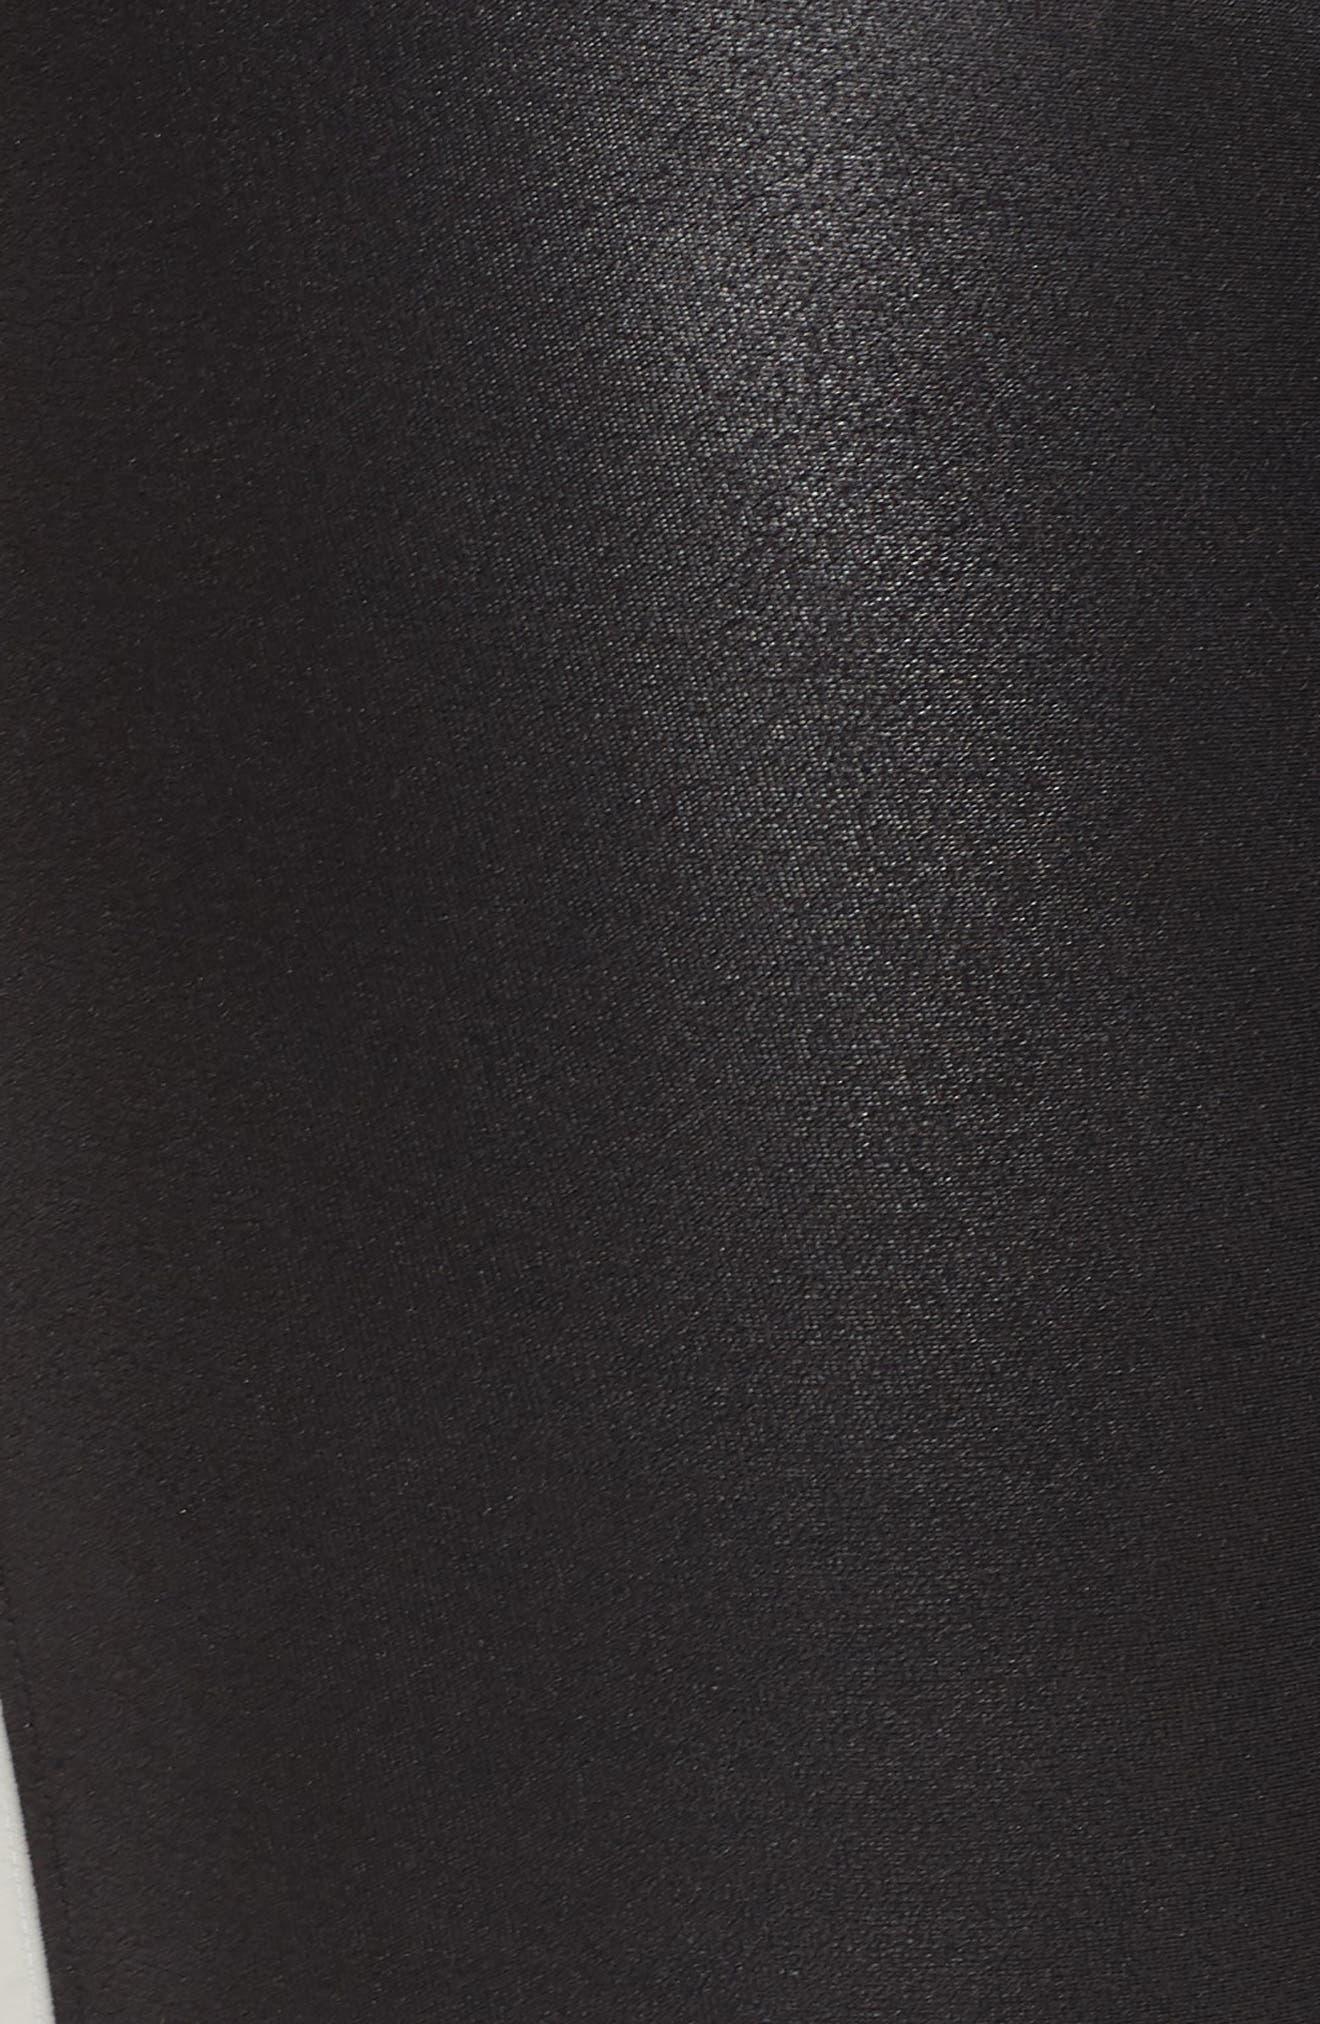 Side Stripe Faux Leather Leggings,                             Alternate thumbnail 6, color,                             VERY BLACK/WHT